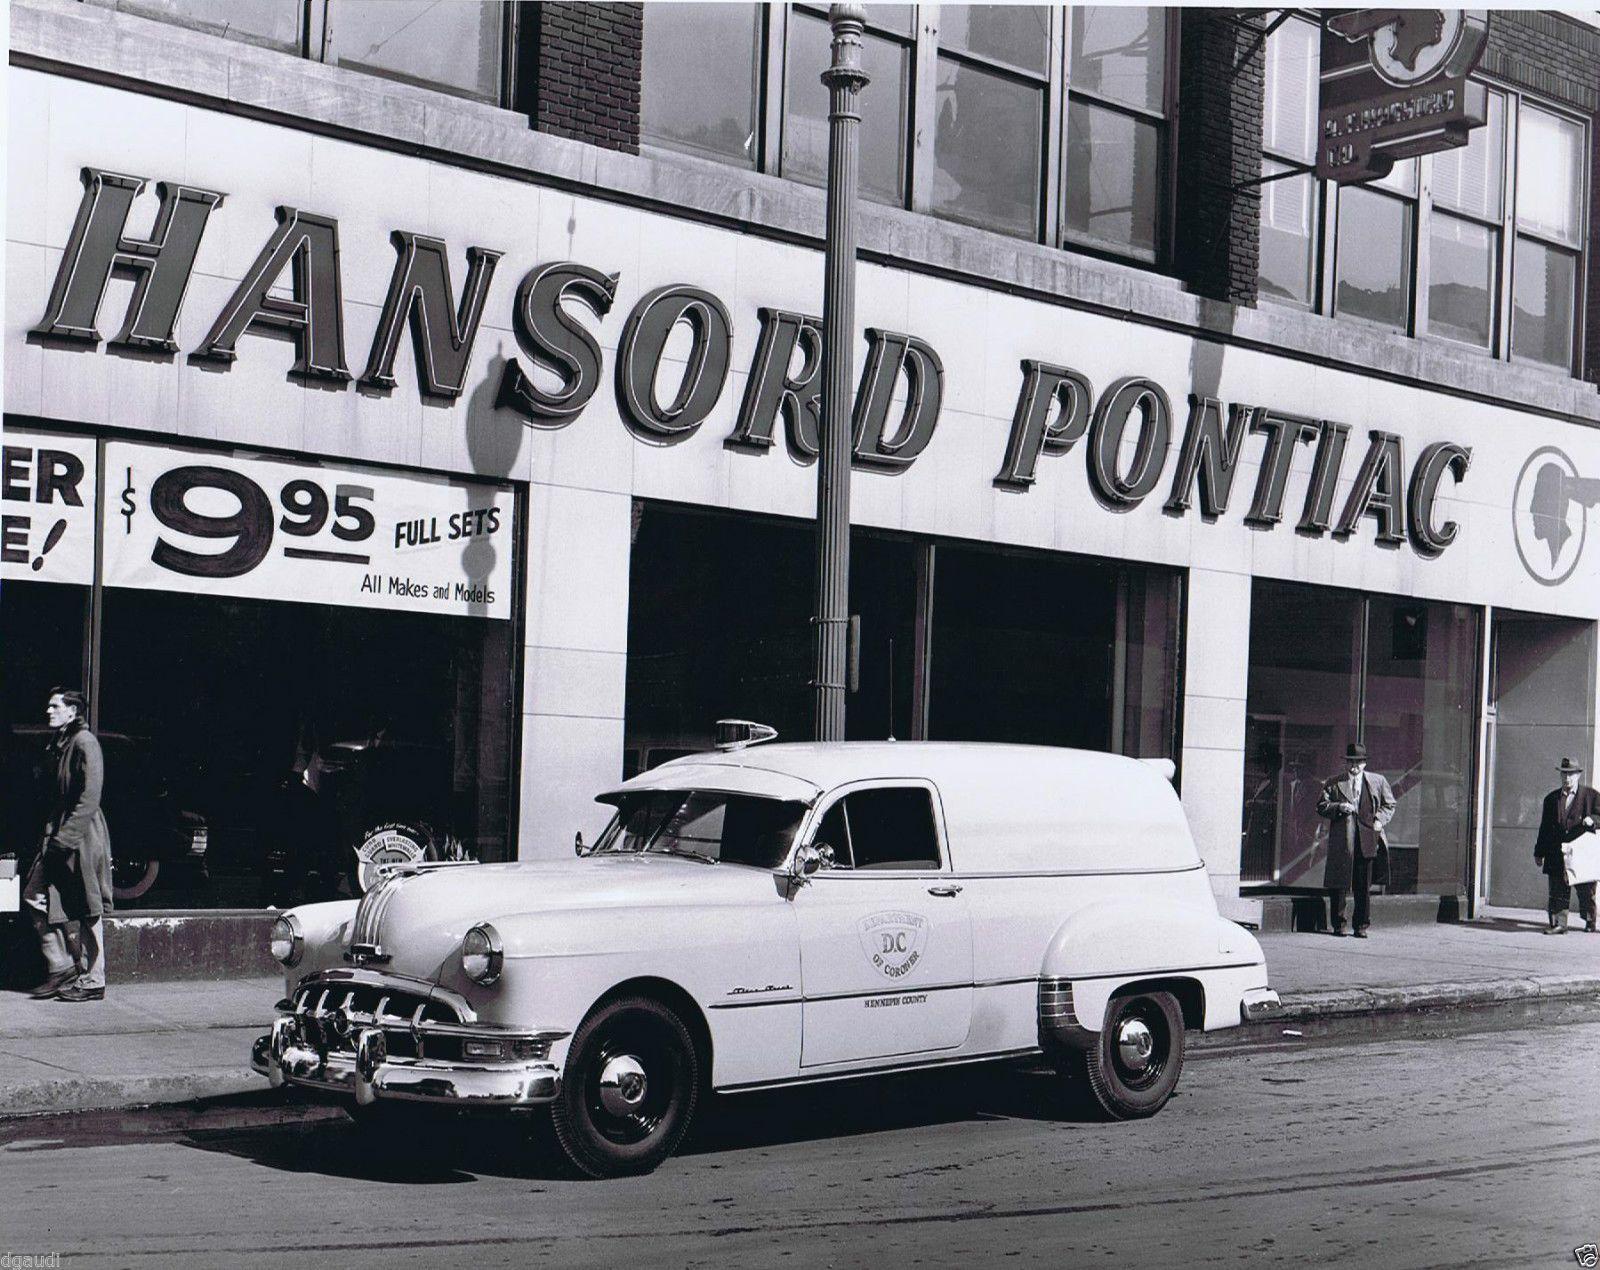 Pontiac Dealership DC 1950s Hansord B&W 8 x 10 Photograph